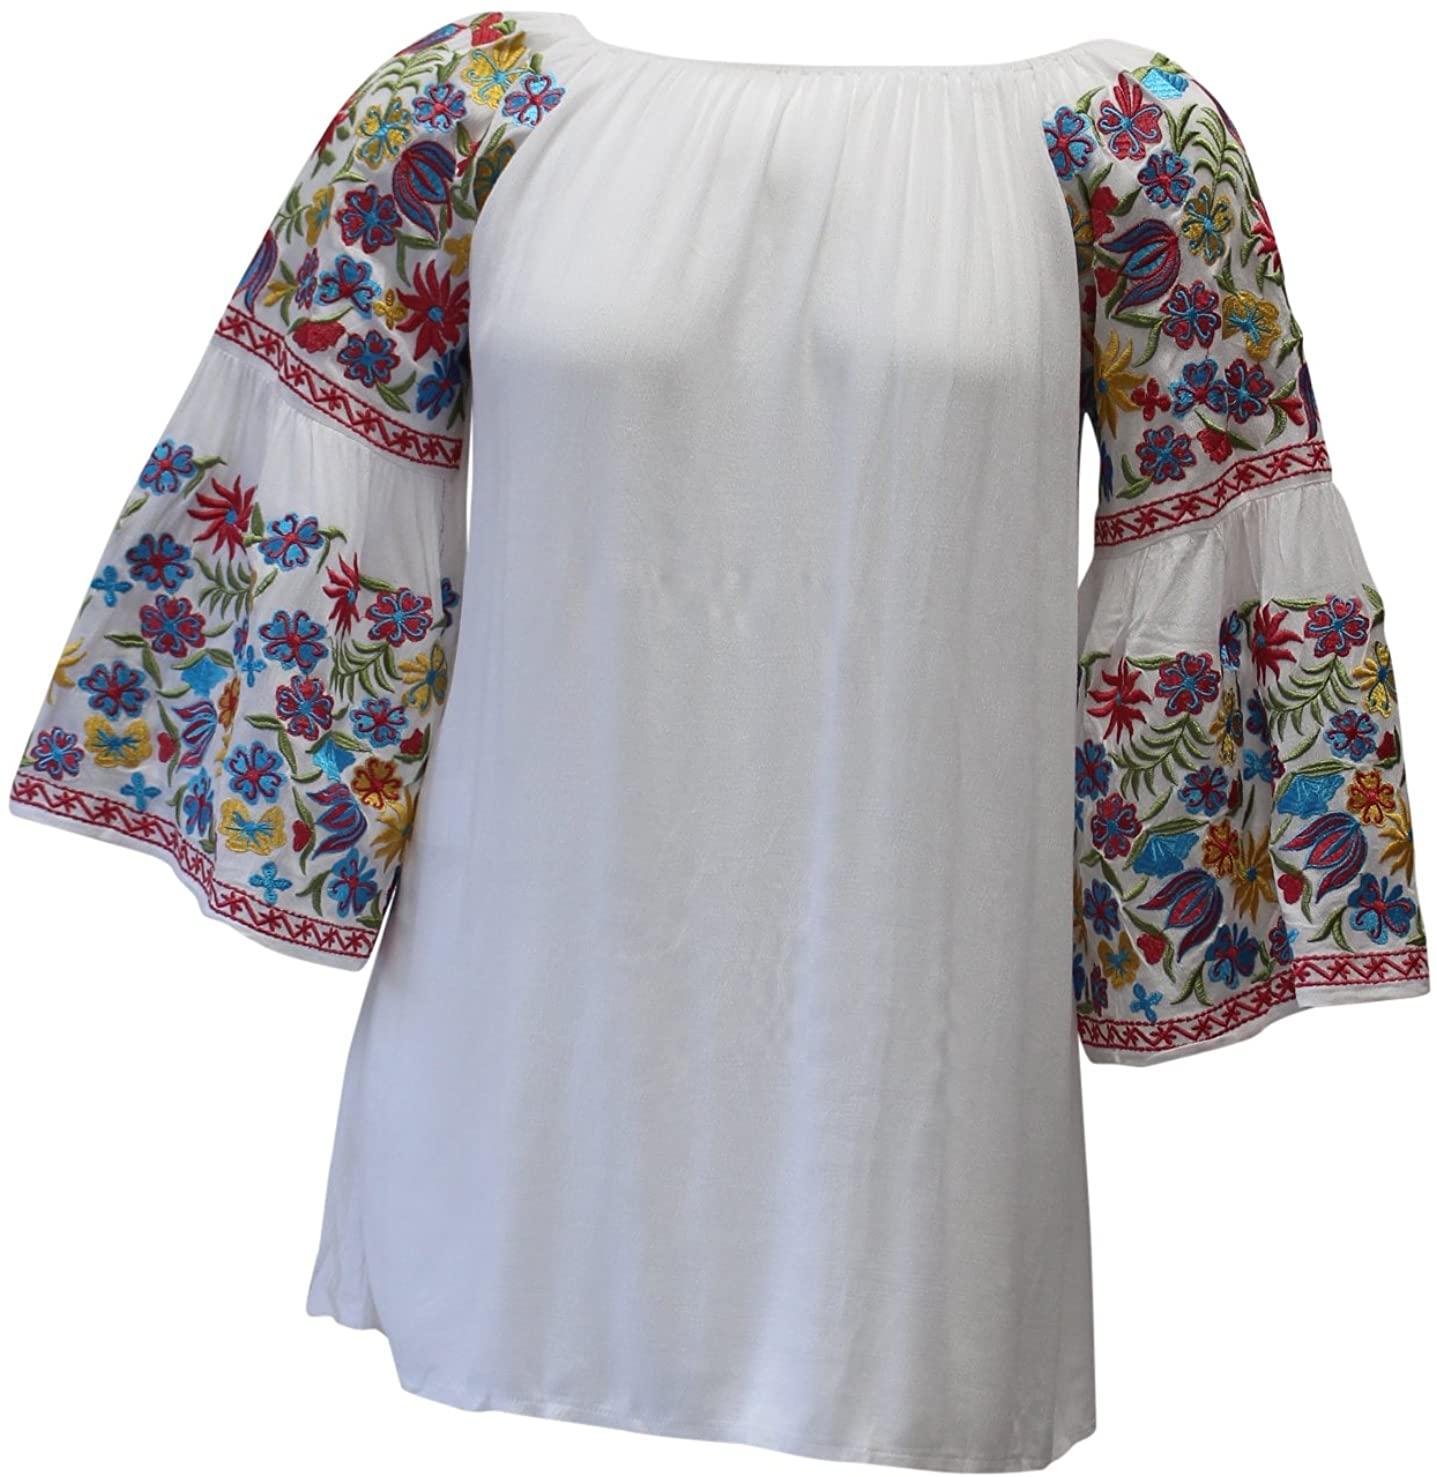 Velzera Women's Floral Embroidered Off The Shoulder Tunic Mini Dress Reg & Plus Size